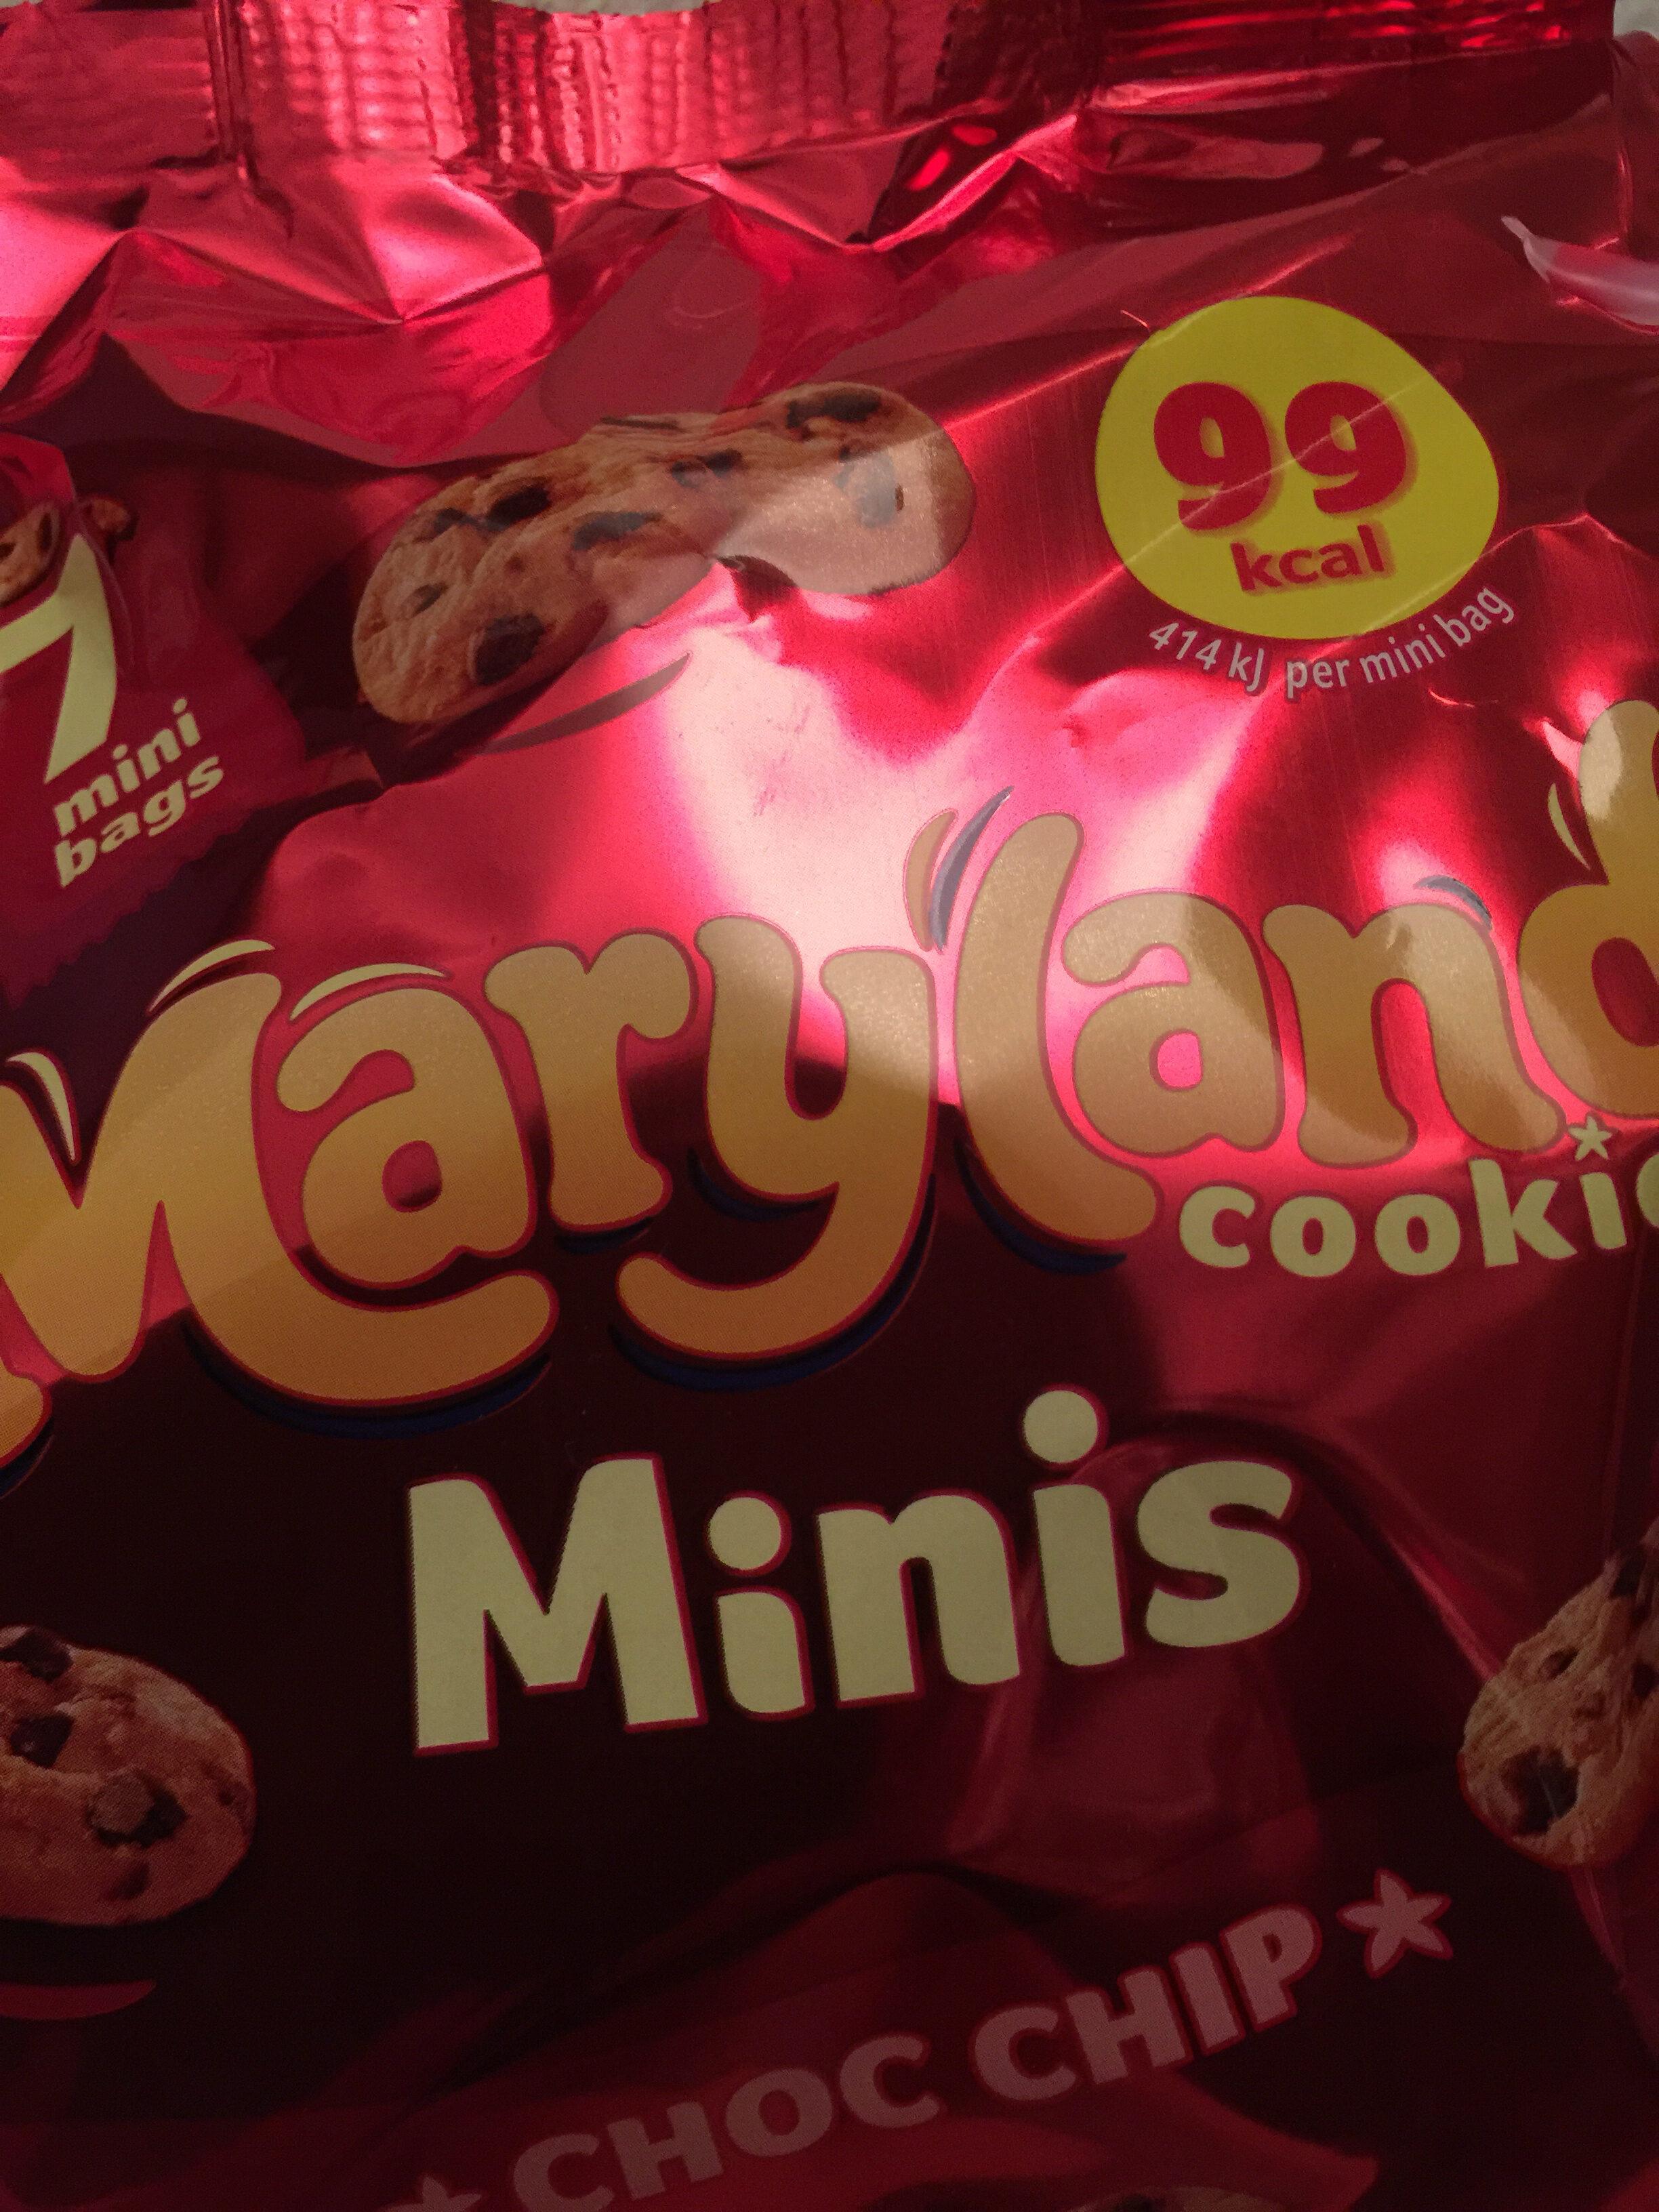 Cookies minis - Produit - en